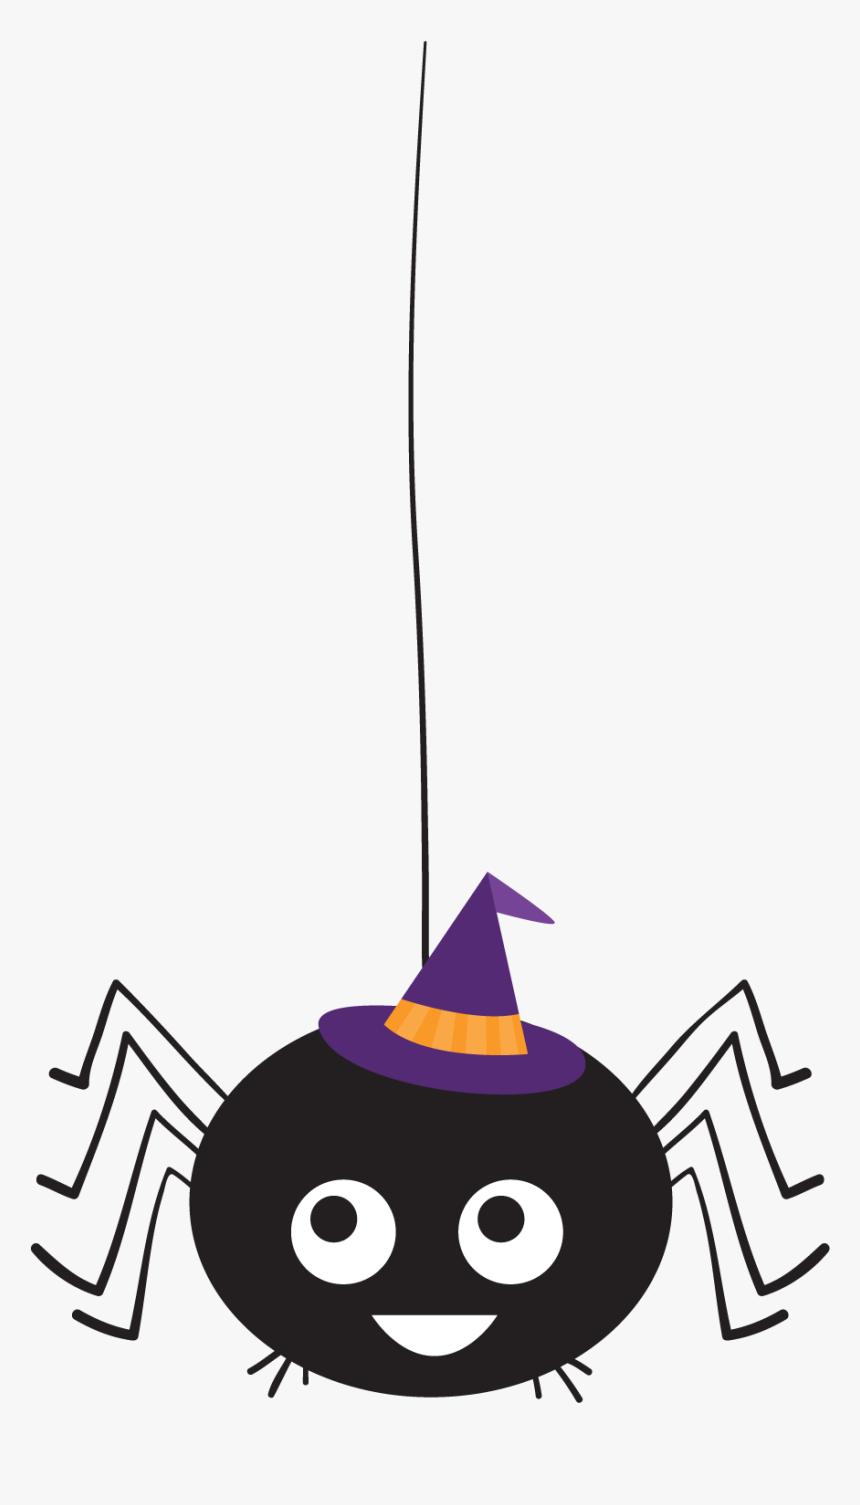 Halloween Spider Clipart.Halloween Spiders Clipart Oh Transparent Cartoons Halloween Spider Clipart Hd Png Download Transparent Png Image Pngitem